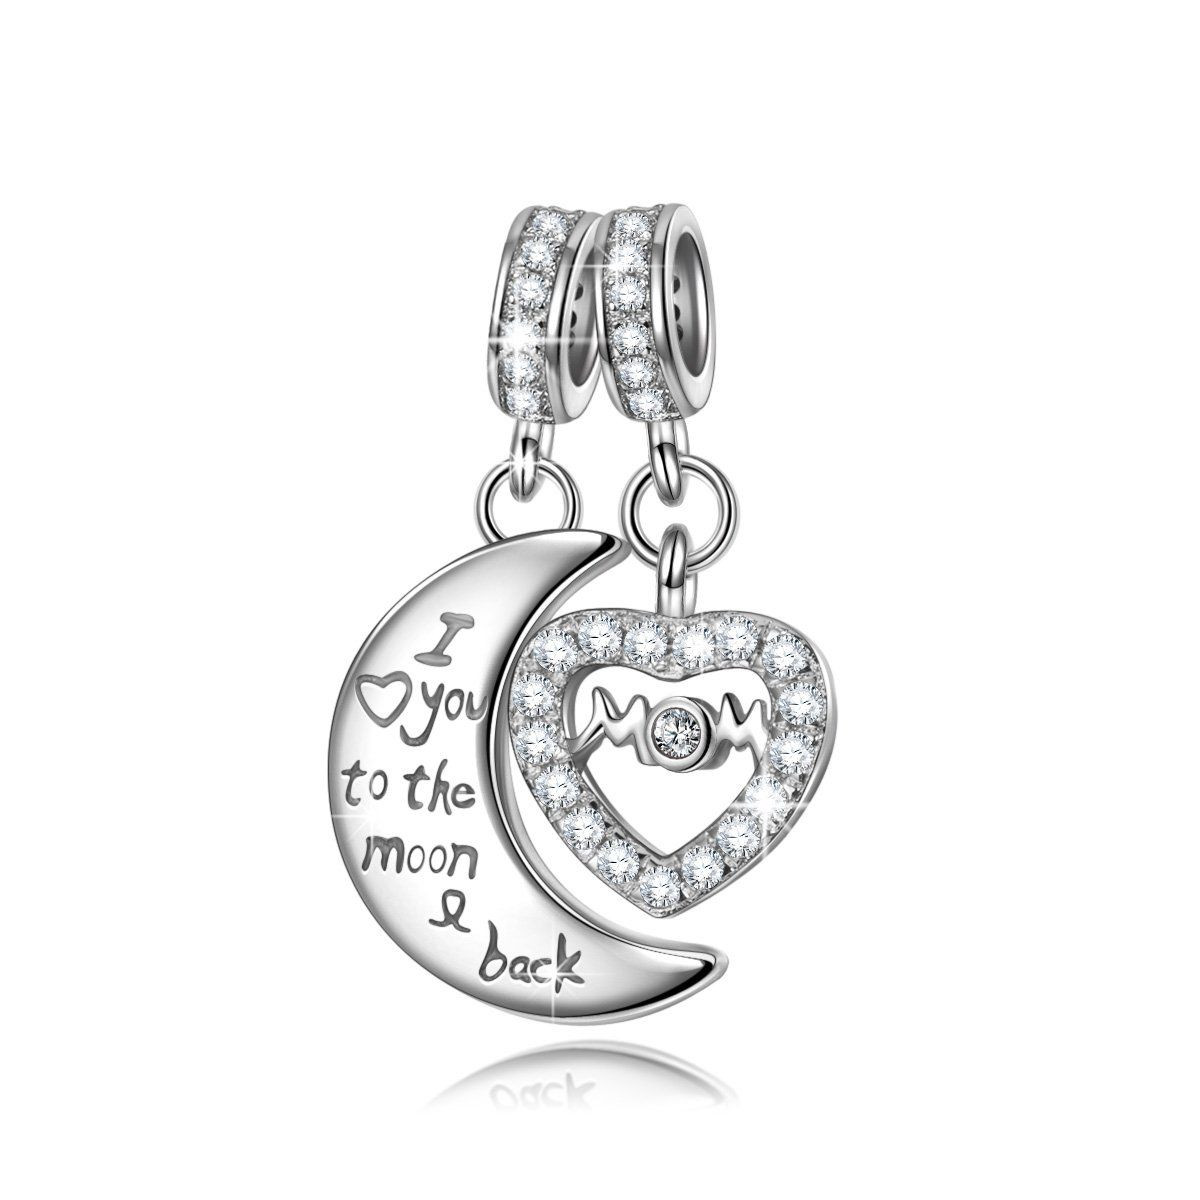 NINAQUEEN - Treasure Box - 925 Sterling Silver Charms Nickel-free 6CRKkmaVT4